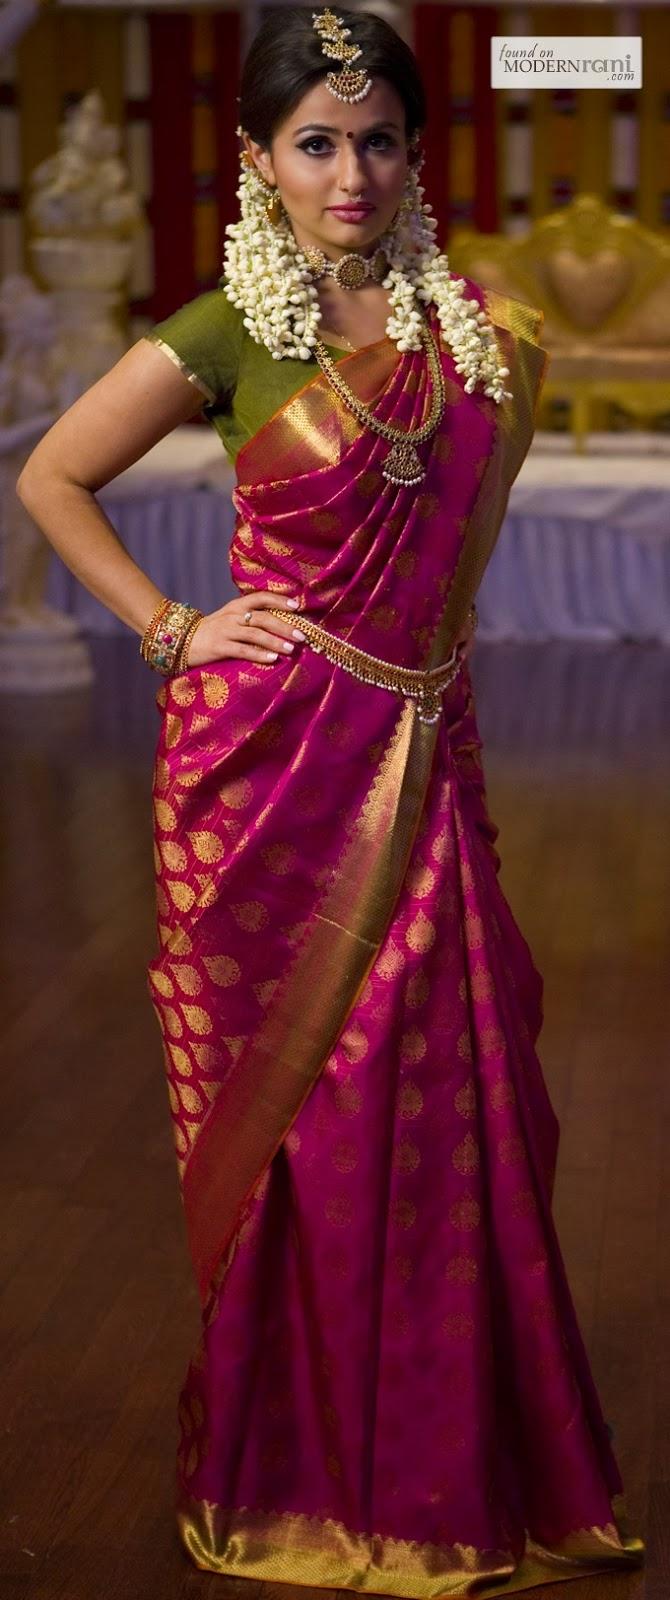 Saree blouse design pattu priya sekar priyasekar on pinterest